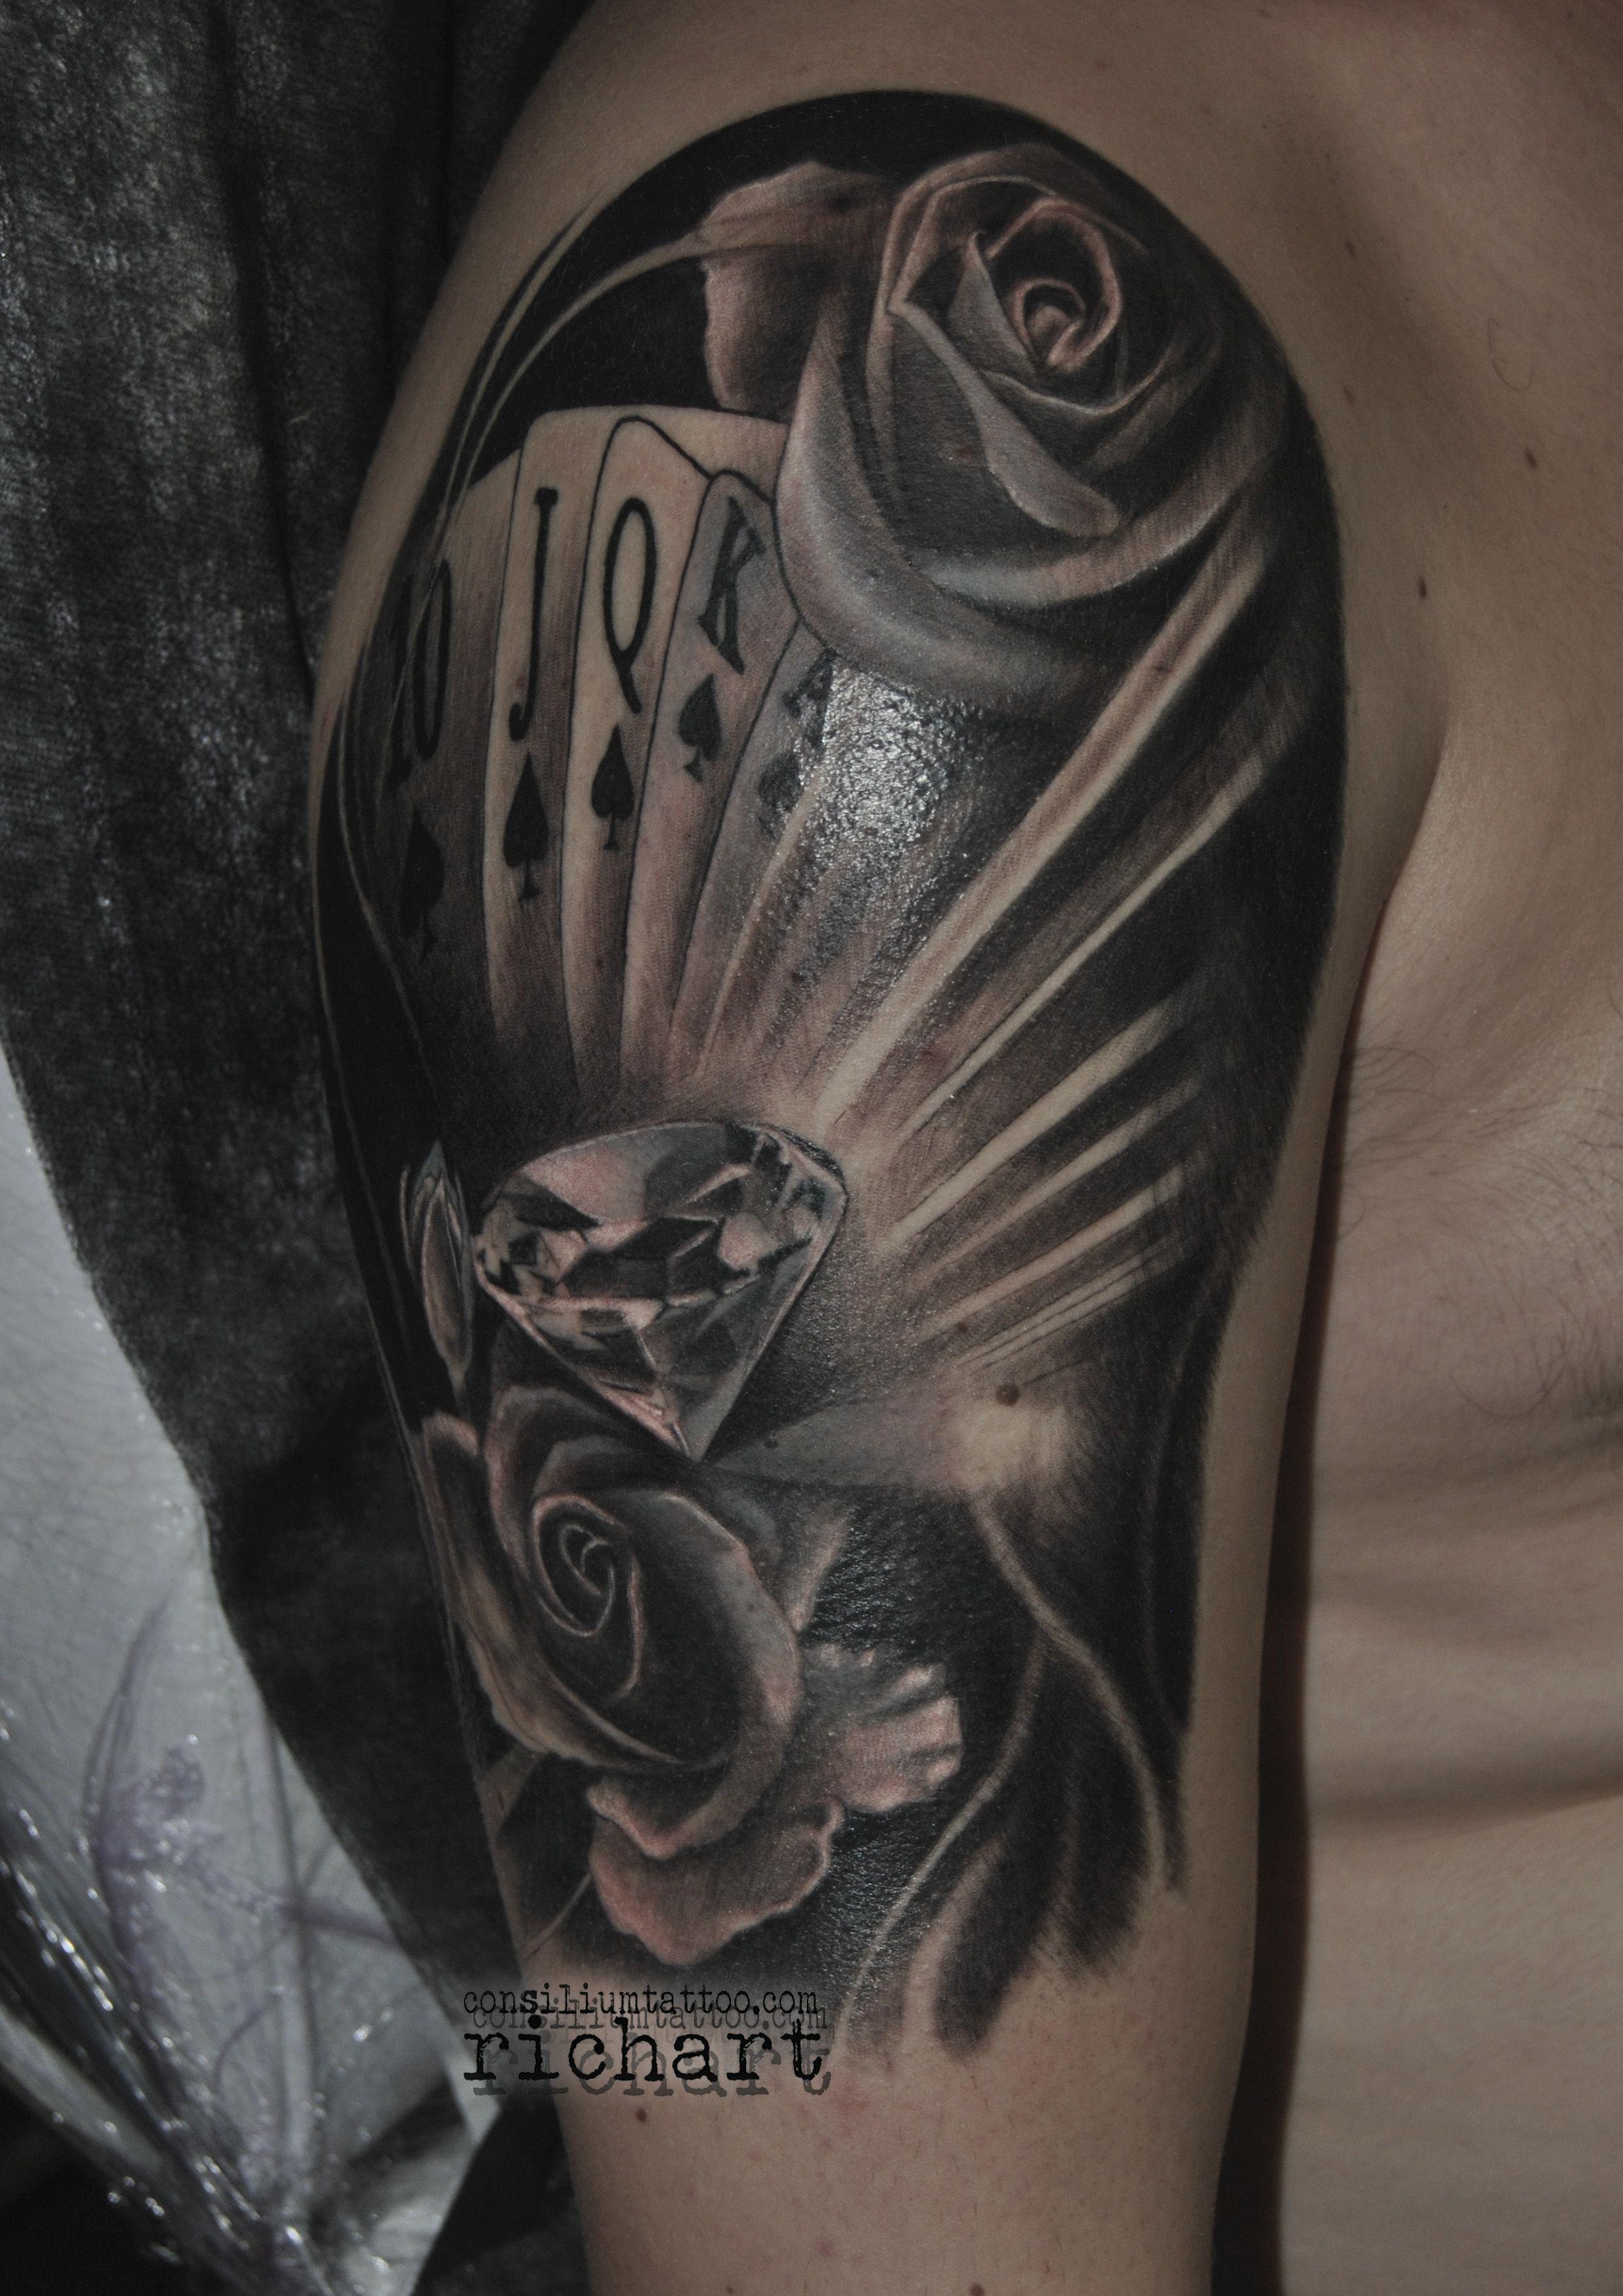 Tatuaje Tatuajes Tattoo Diamante Cartas De Poker Y Rosas Para El